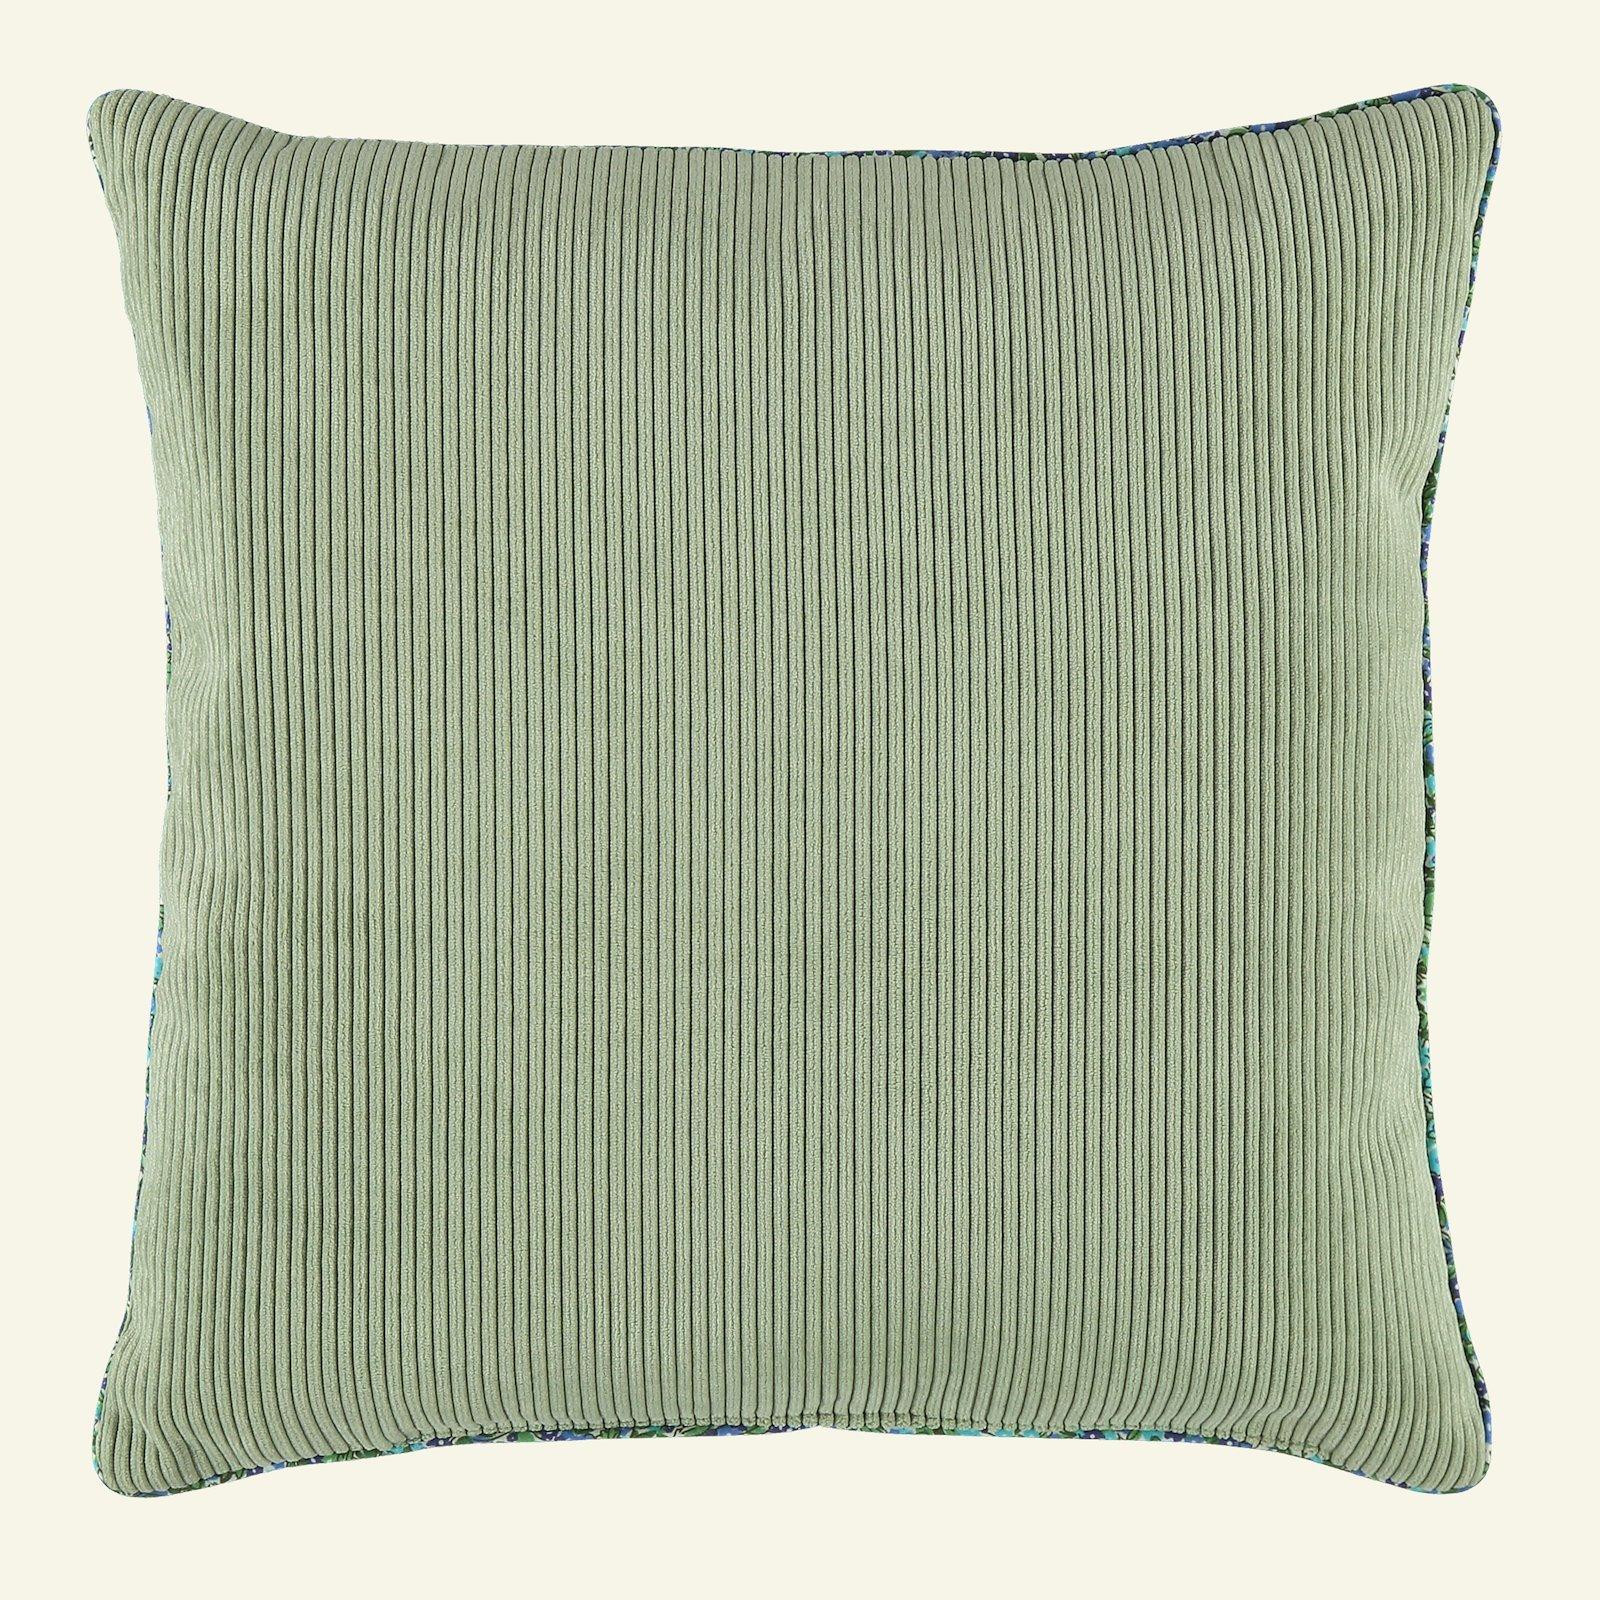 Upholstery corduroy 6 wales light sage 824035_sskit